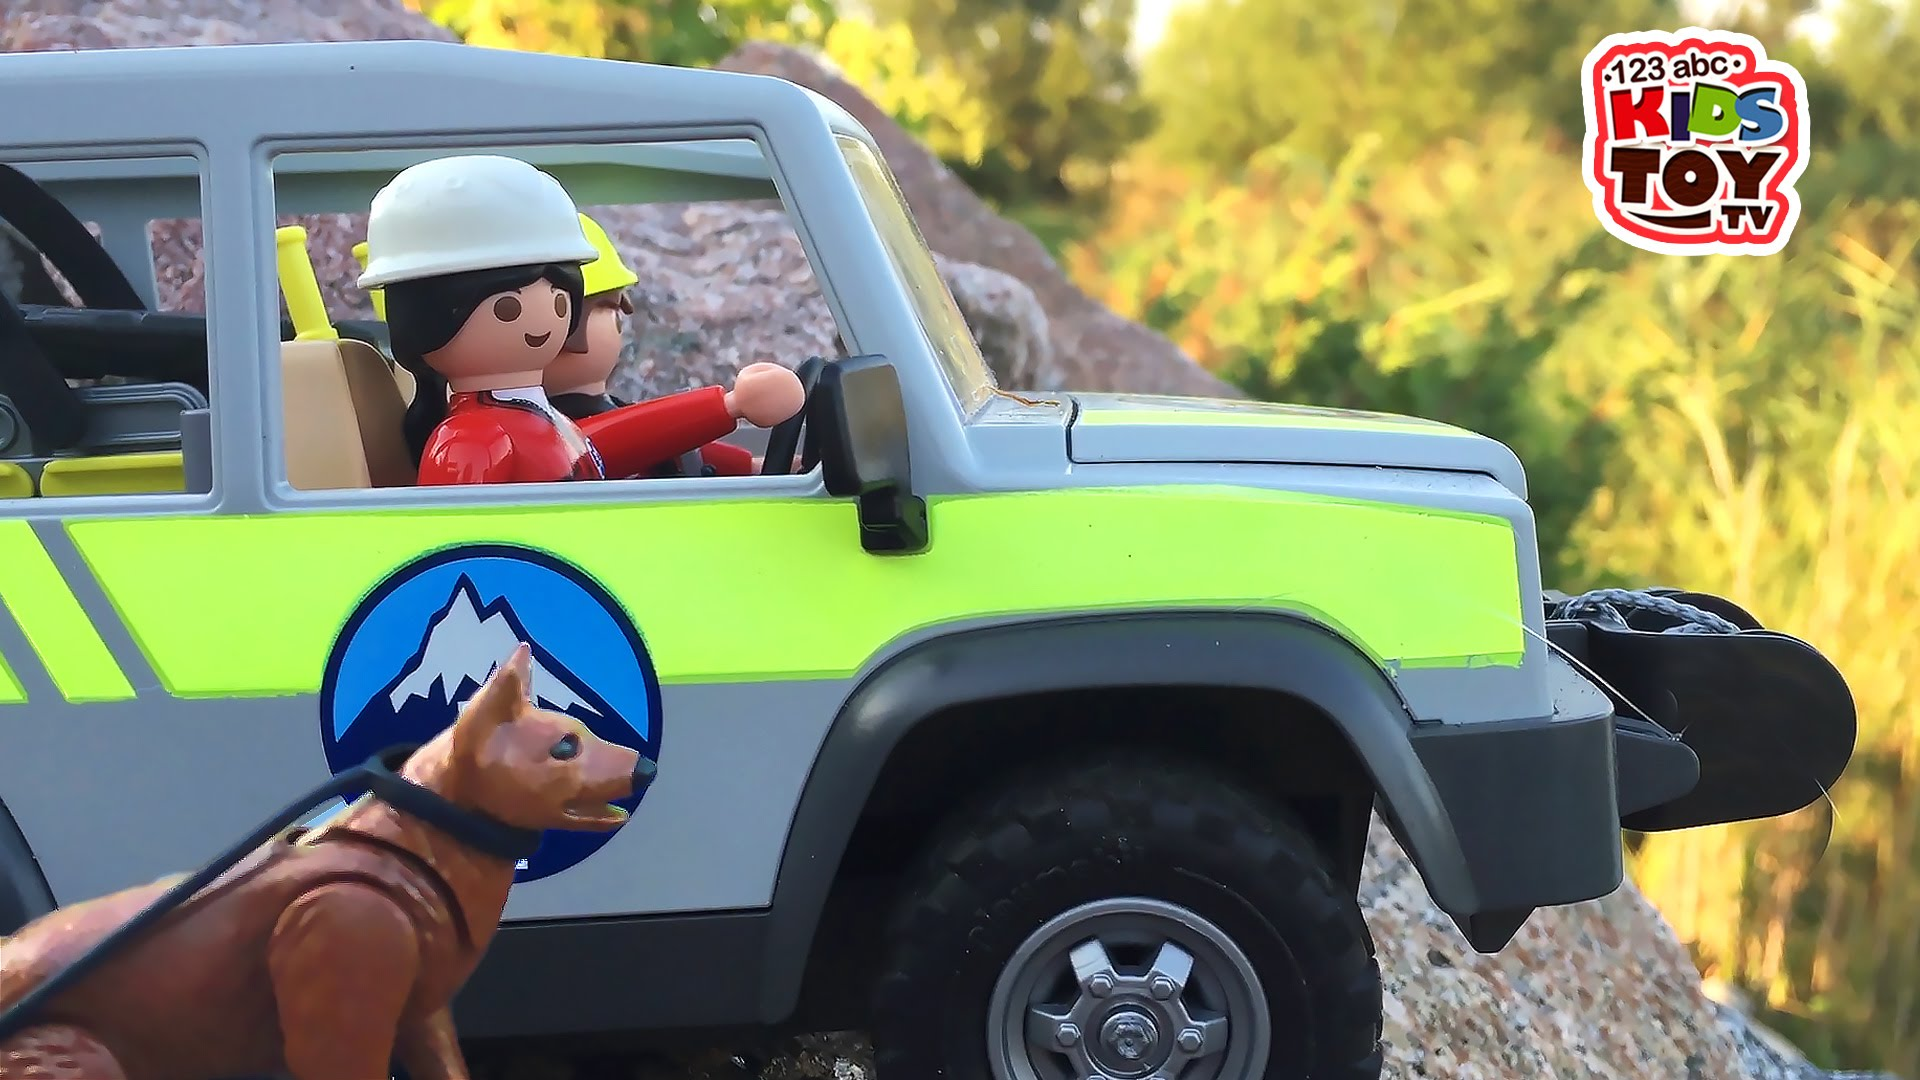 De King Police Jouet Playmobil Commissariat qVGMpUzS